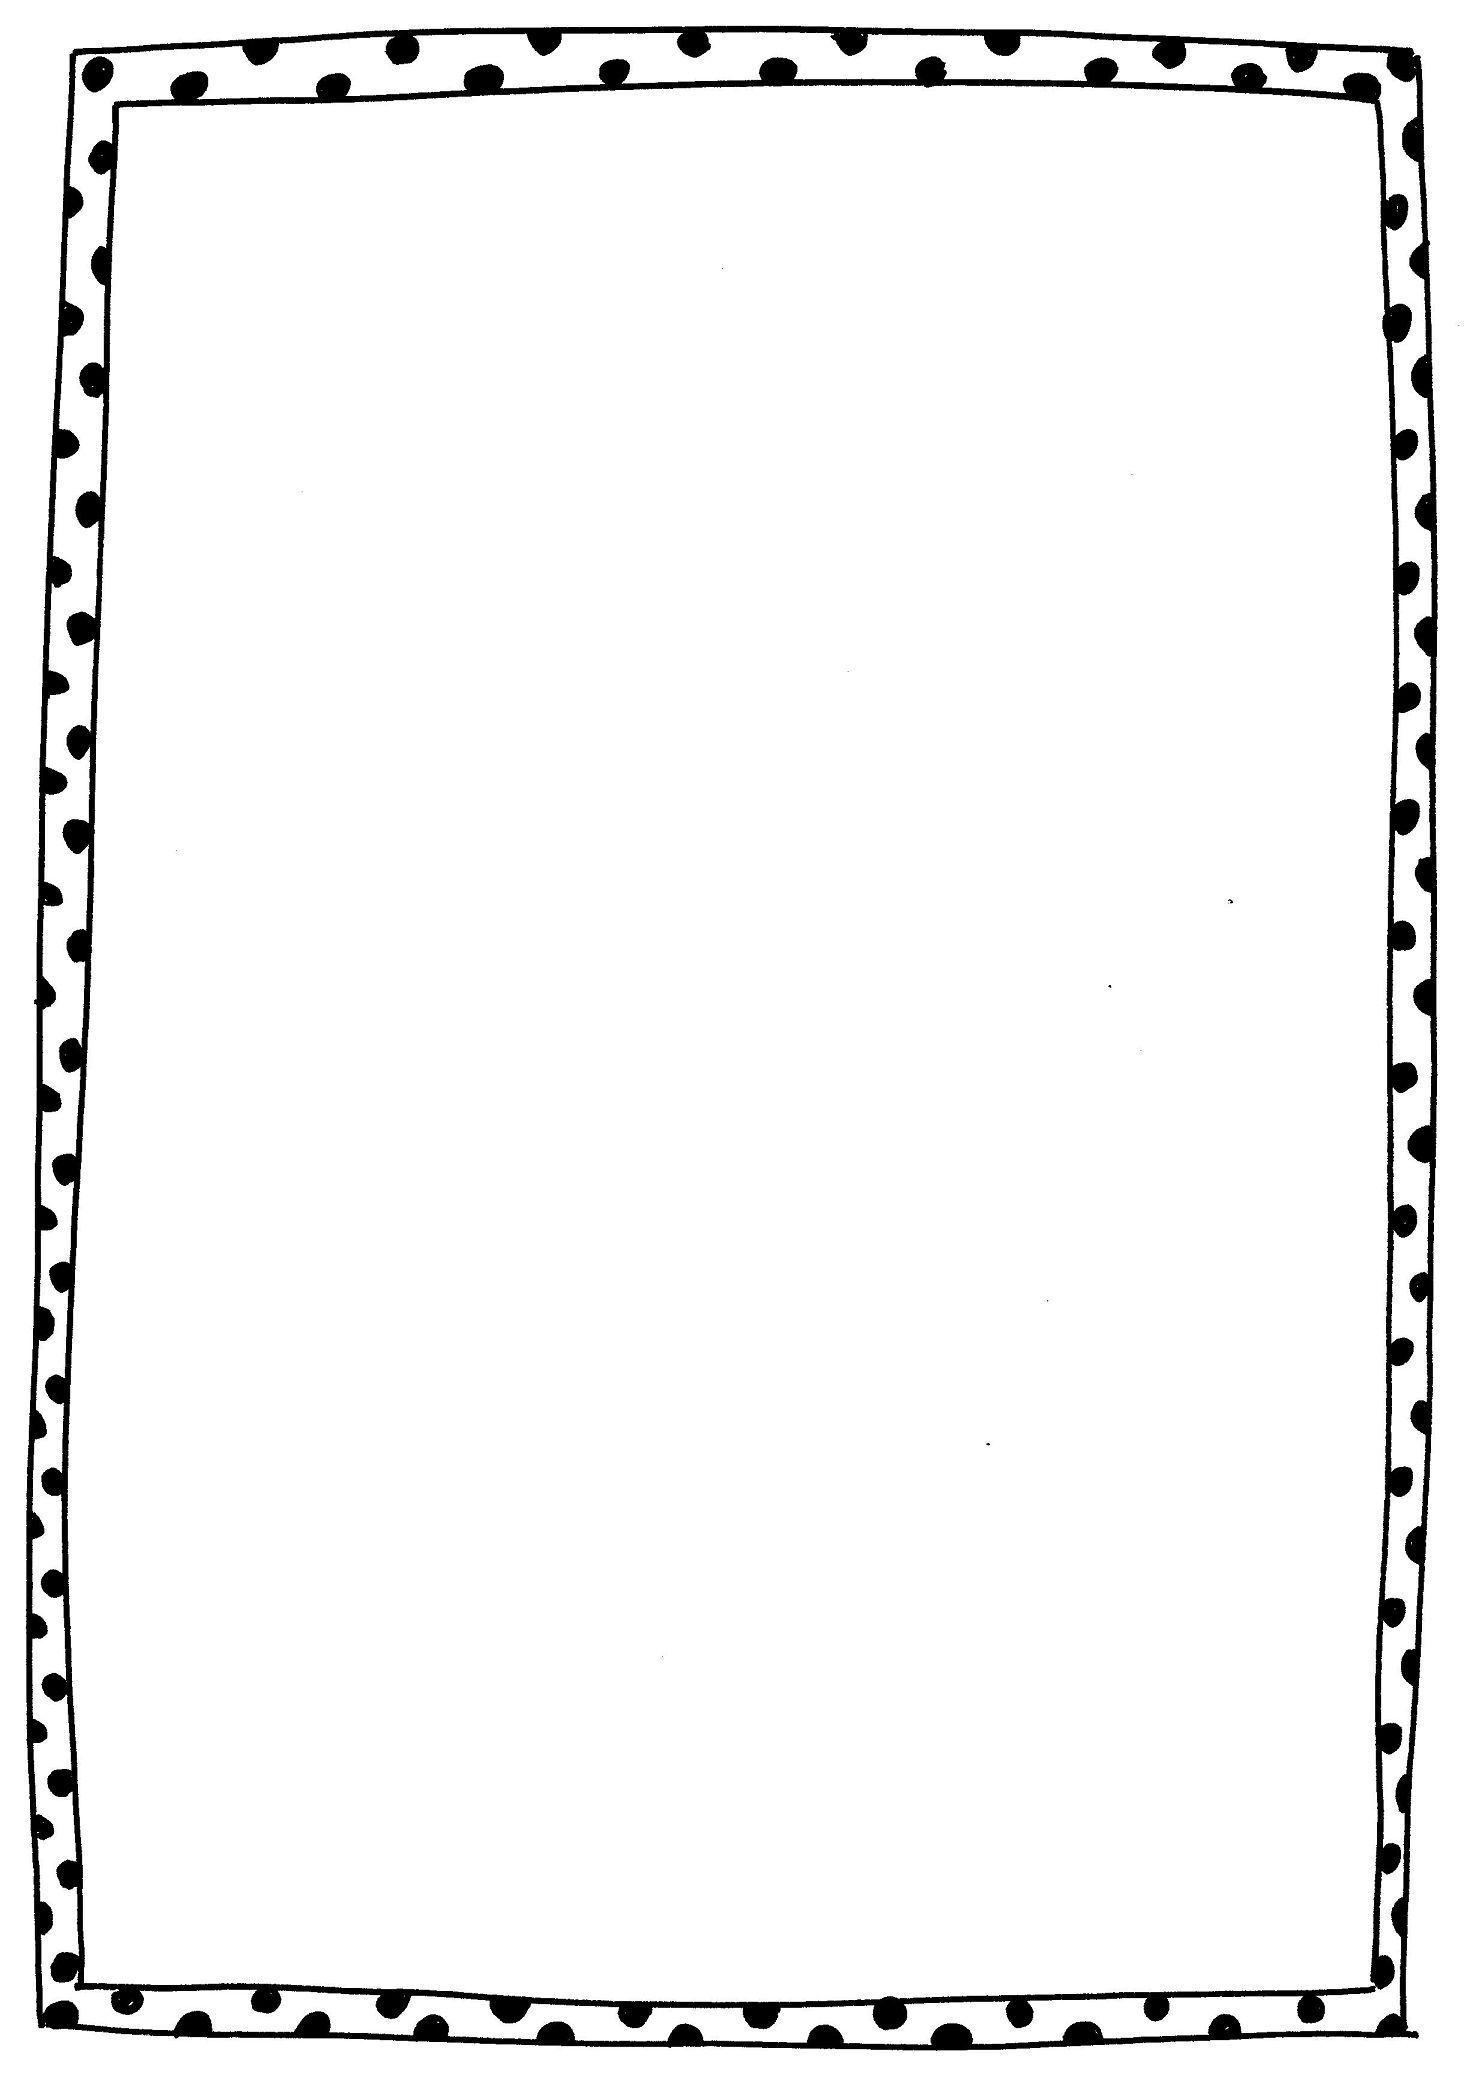 Cadres Et Bordures Libre De Droit Border Hinterhofpoolideen Australien In 2020 Rander Und Rahmen Schmuckrahmen Briefpapier Vorlage